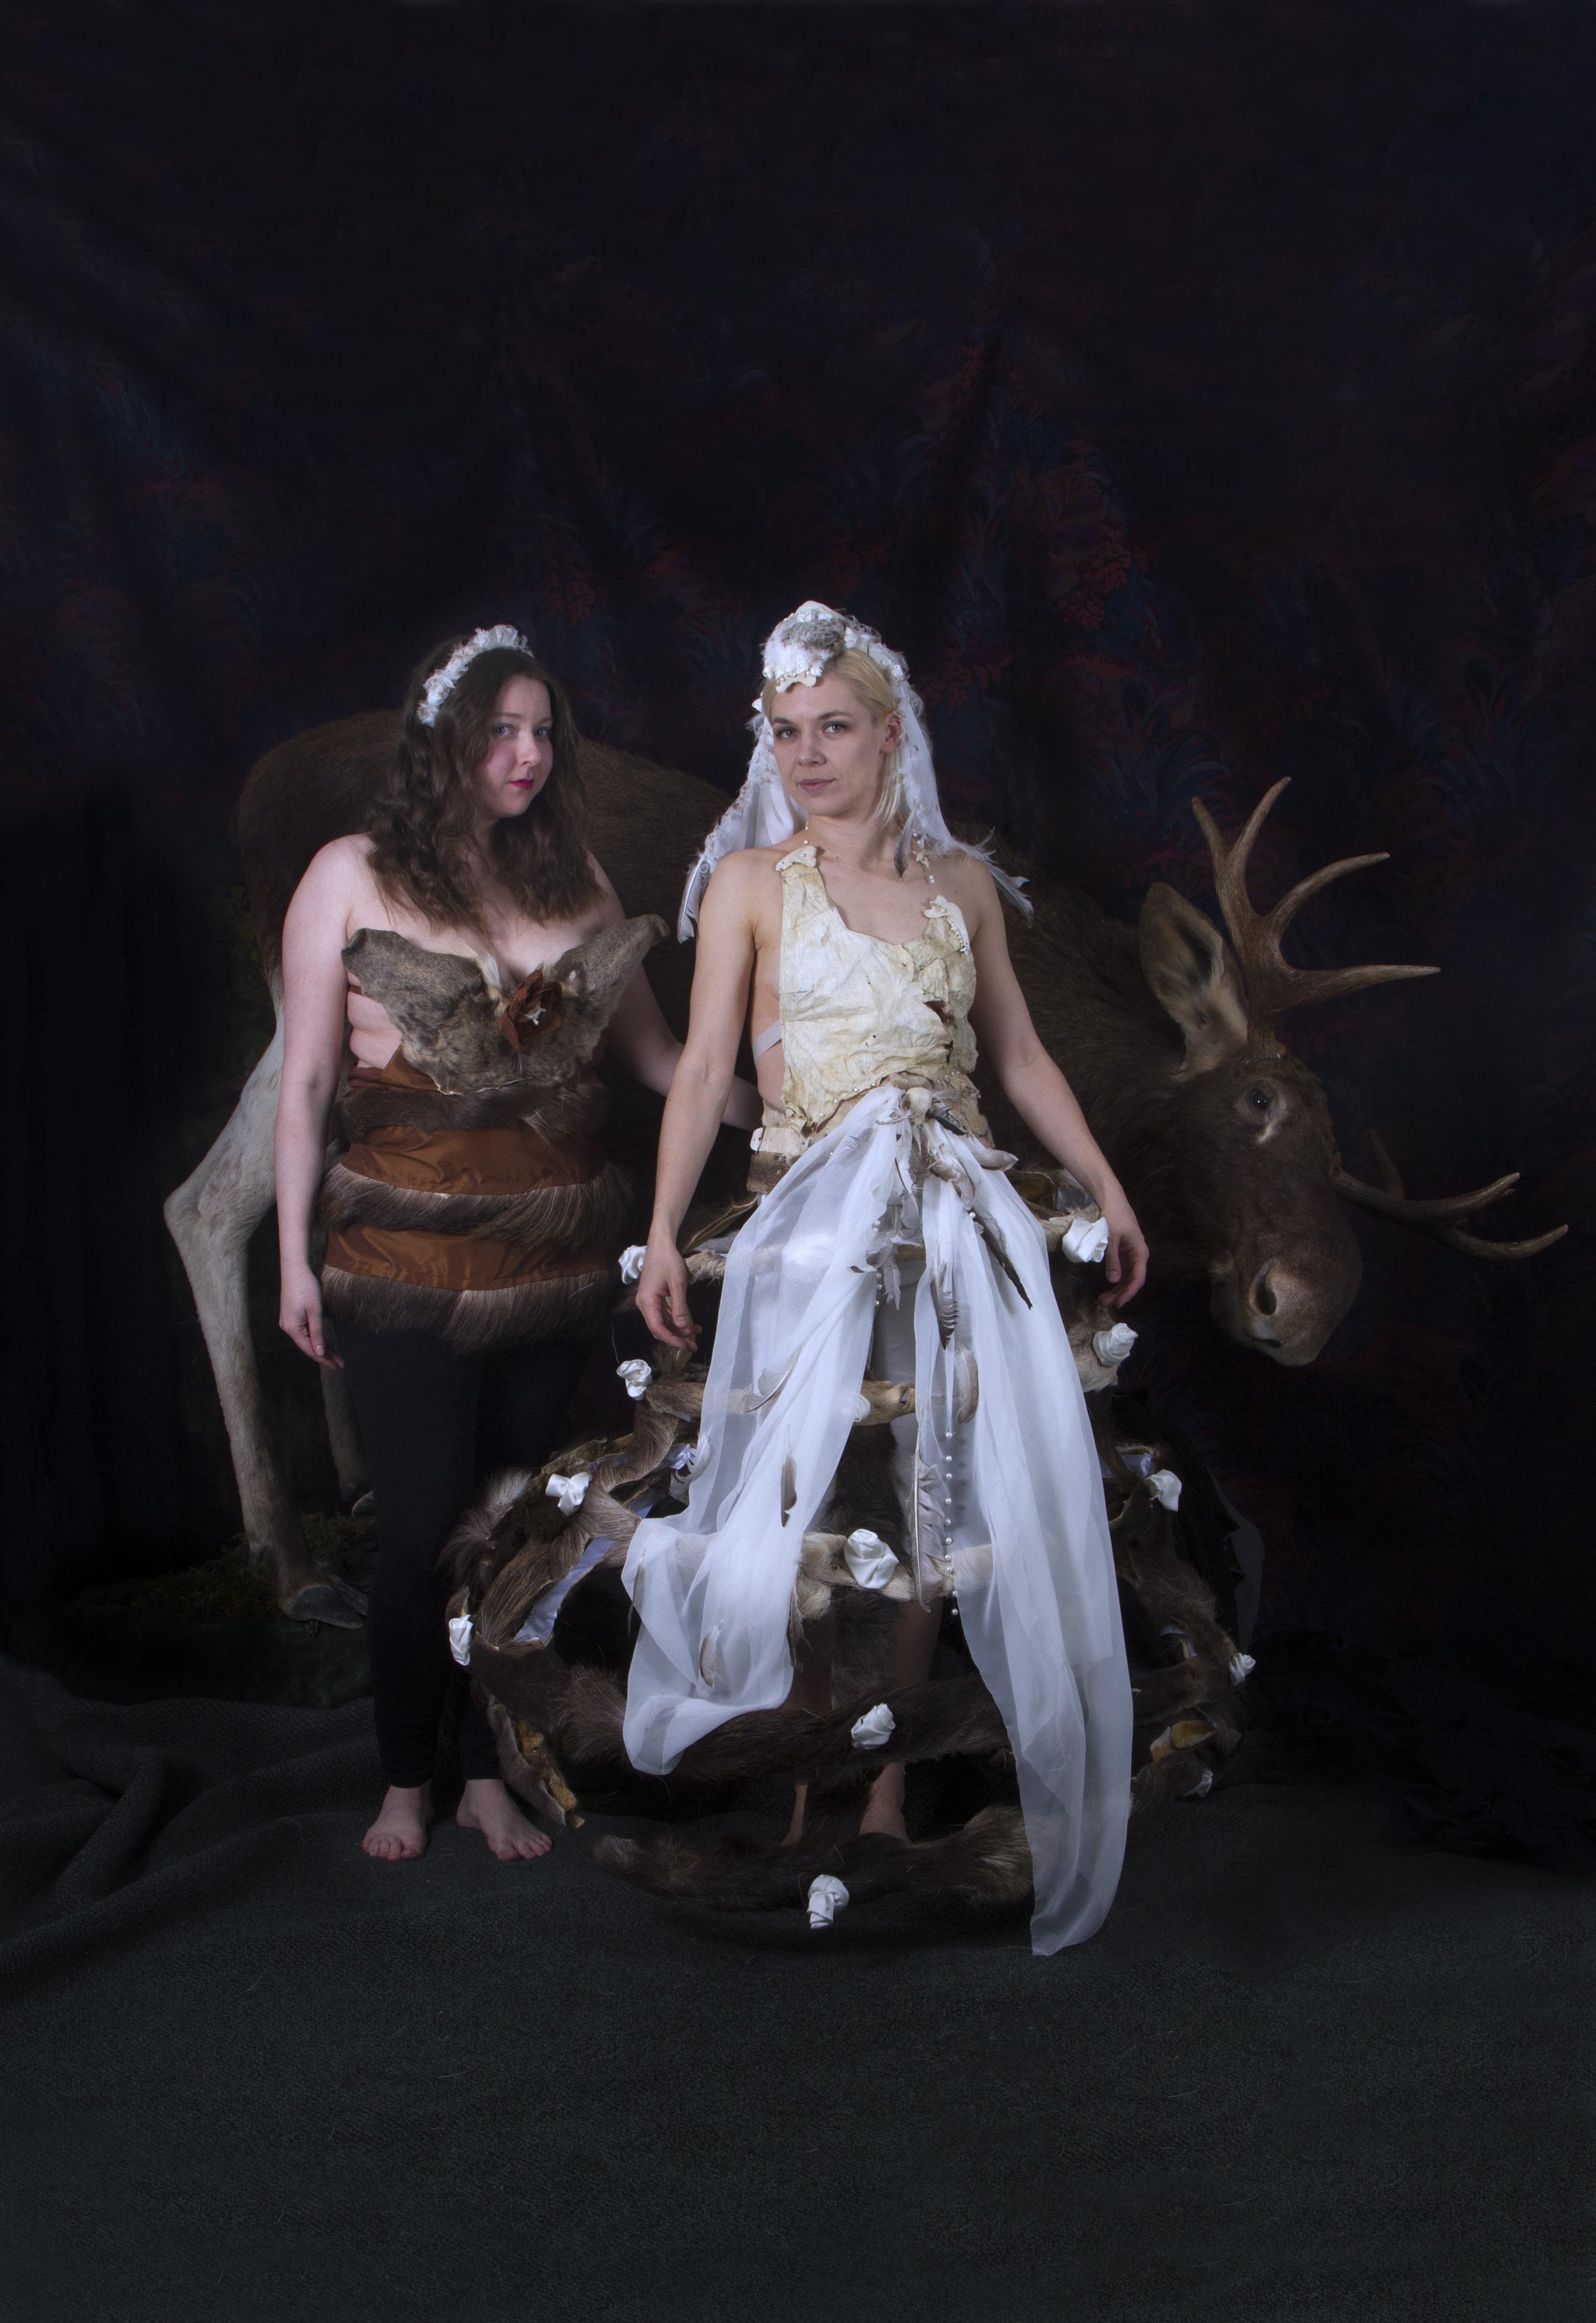 Route Couture: Rituals of Possessing, 2016. Karoliina Paappa